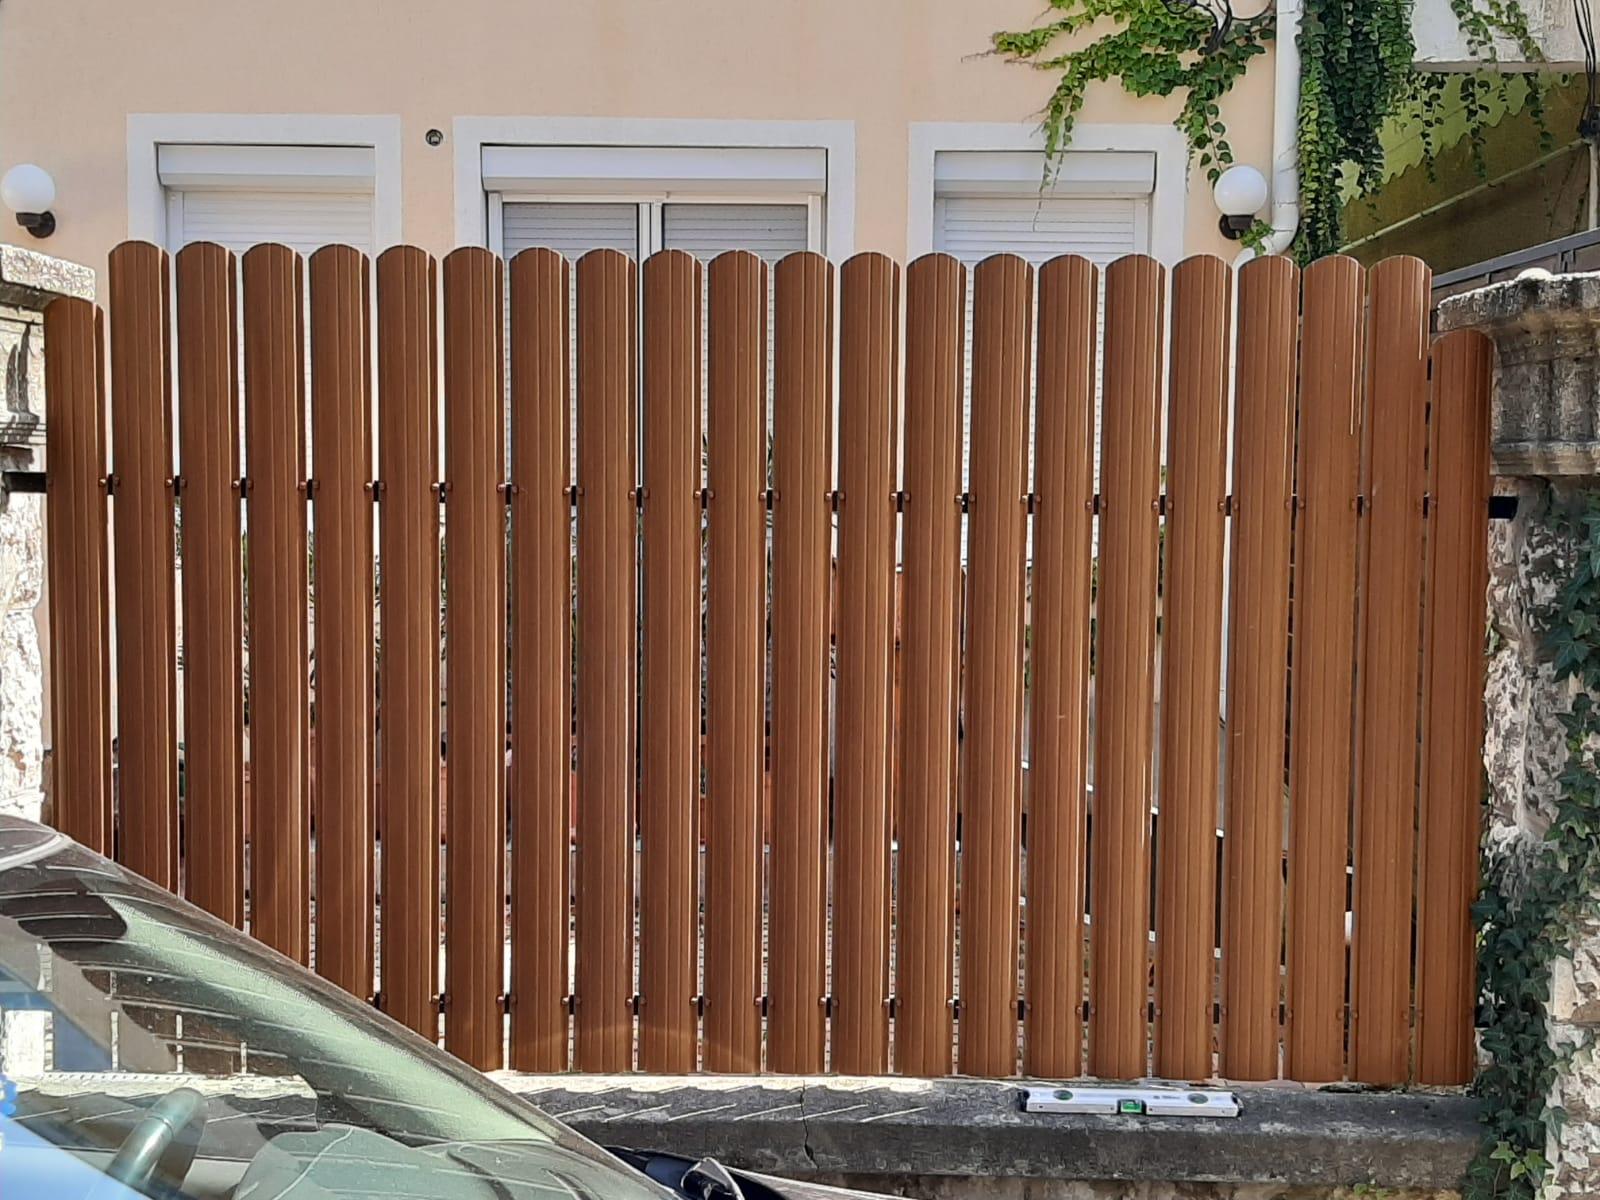 Budafok tüzér u kerítés